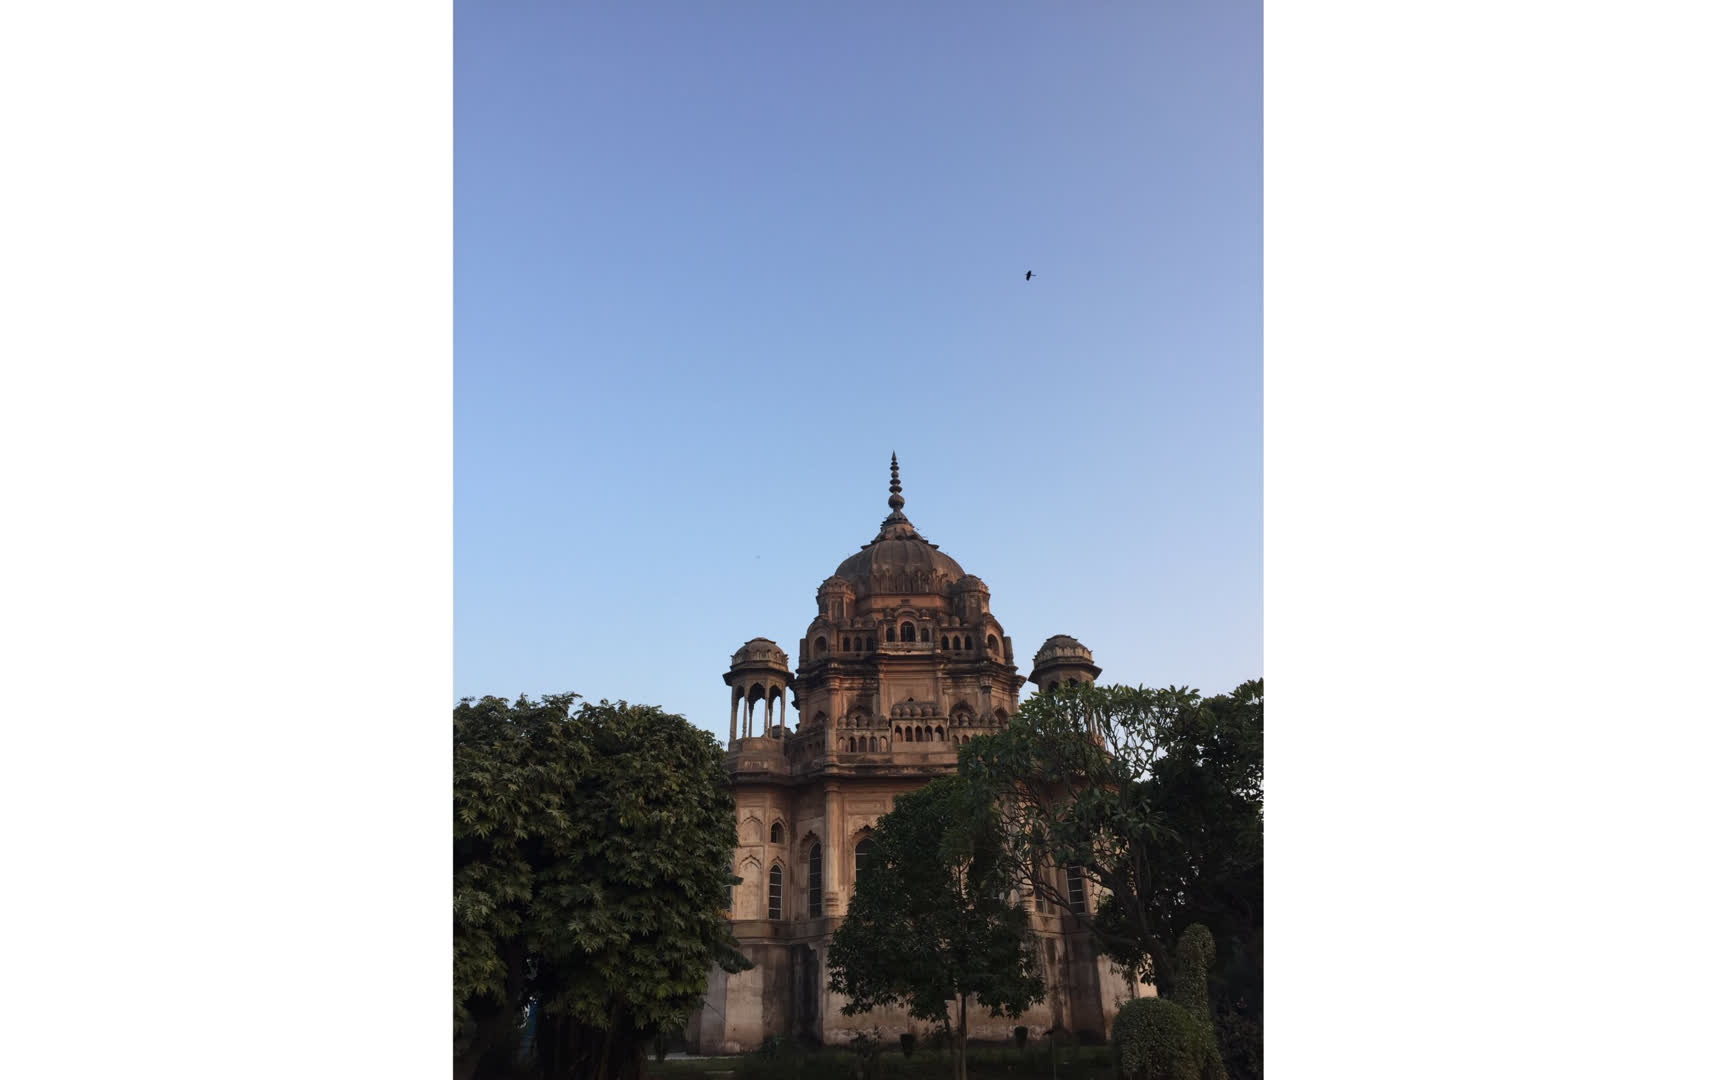 he mausoleum of Khursheed Zadi